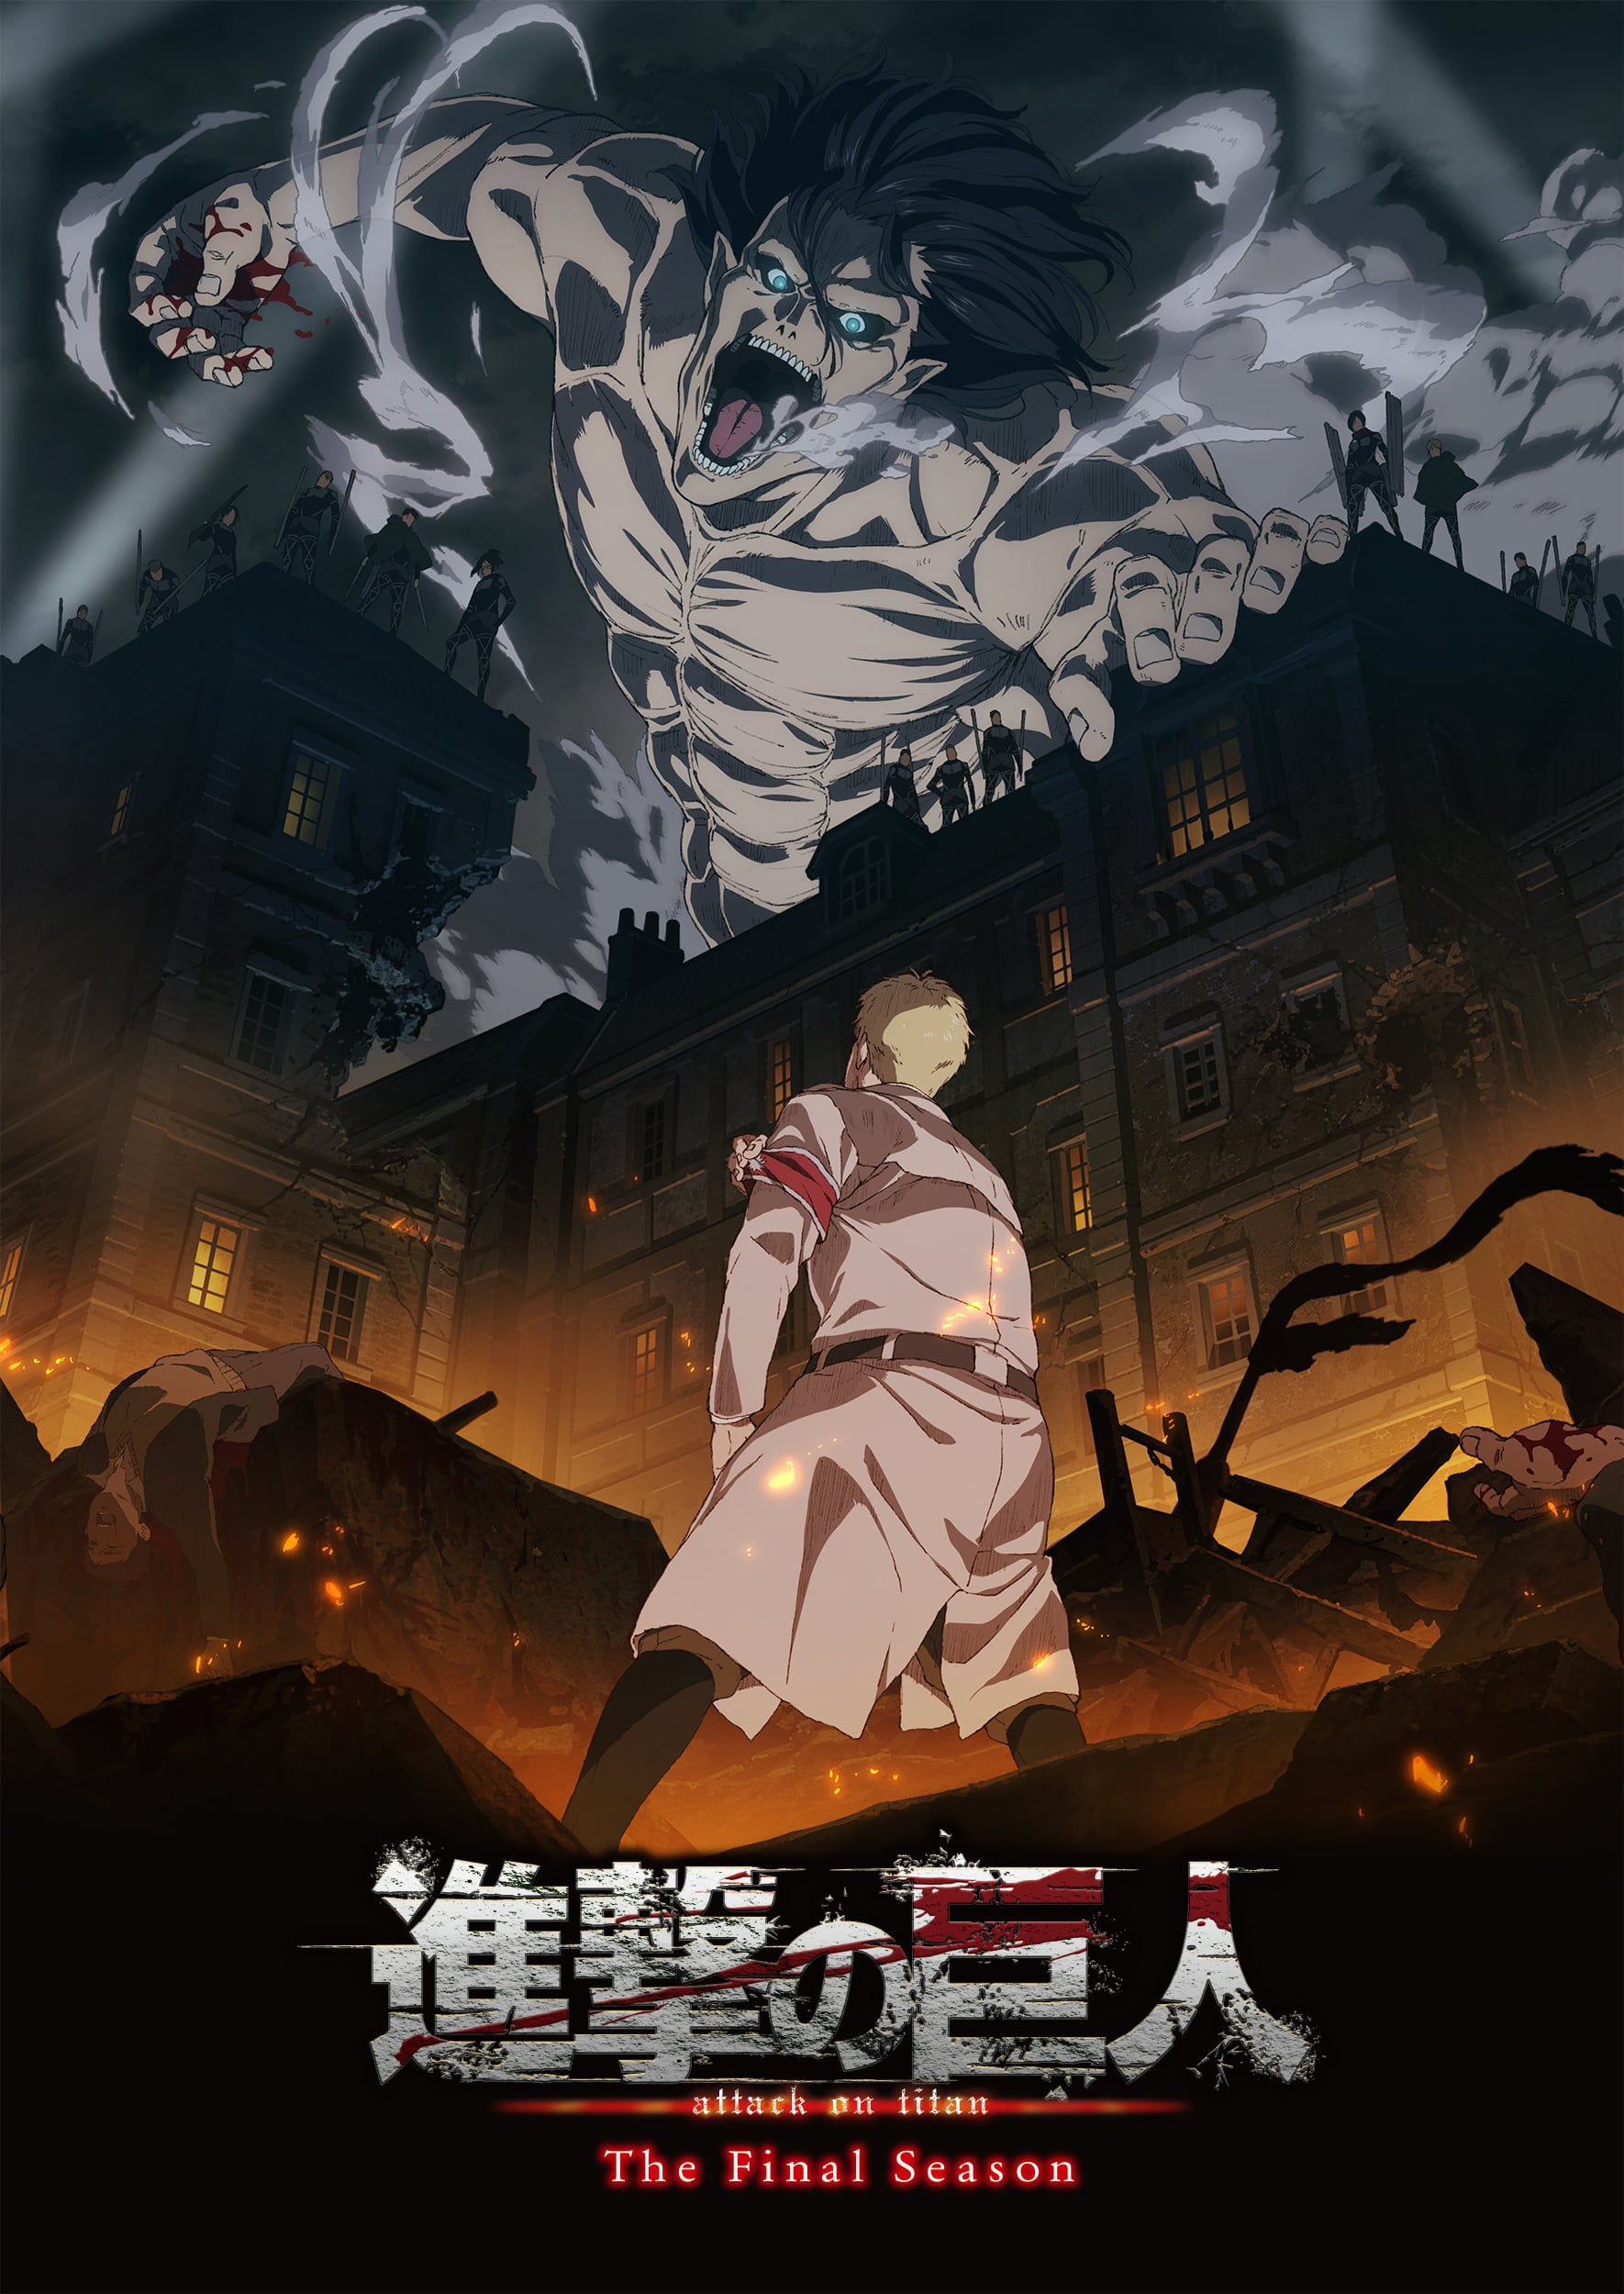 L'Attaque des Titans 4 : Saison finale - Anime (2020)